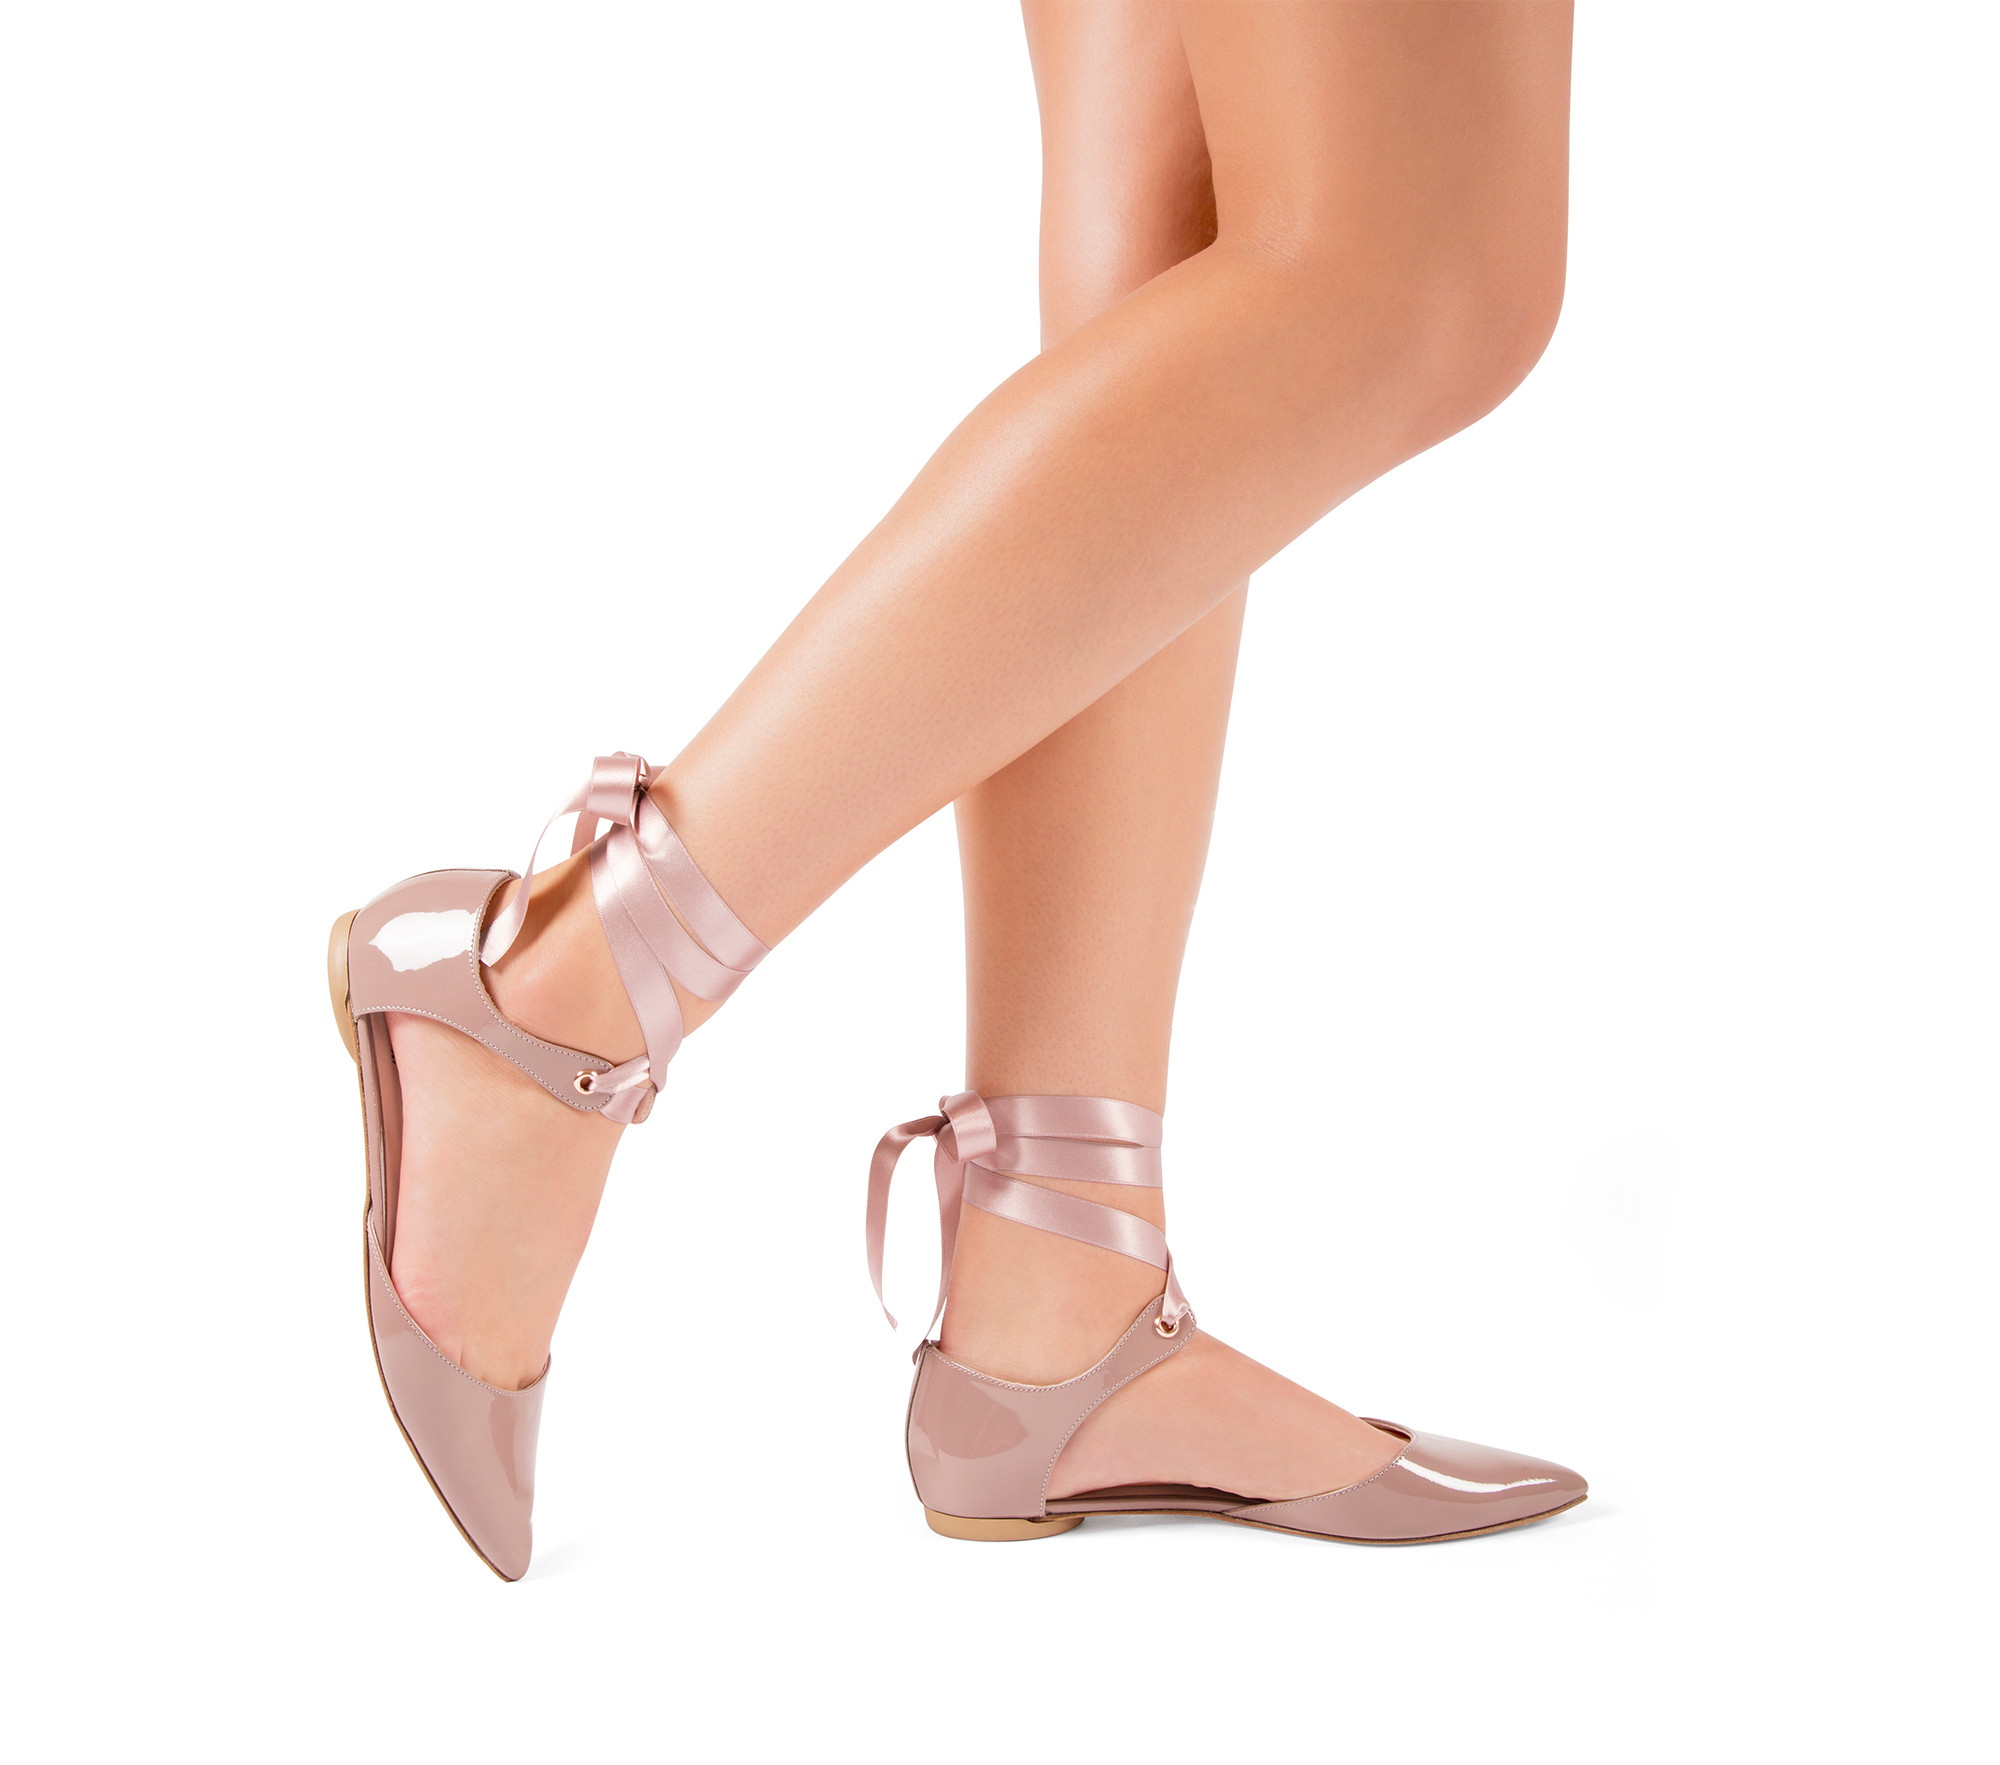 Jordana ballerinas